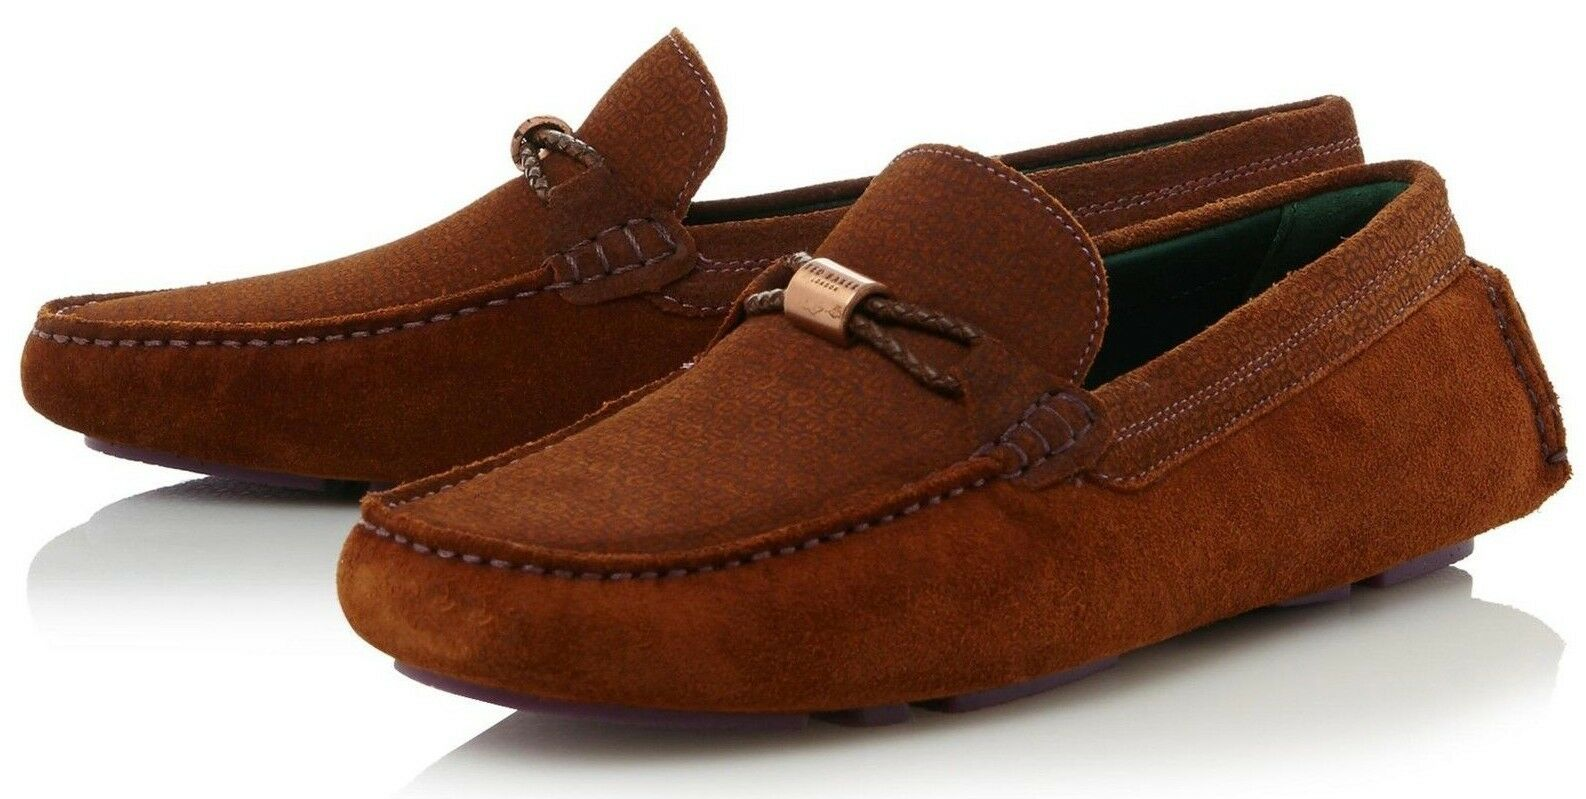 NIB Ted Baker London Carlsun 2 Suede Driving Moccasins Loafer EUR 41 US 8